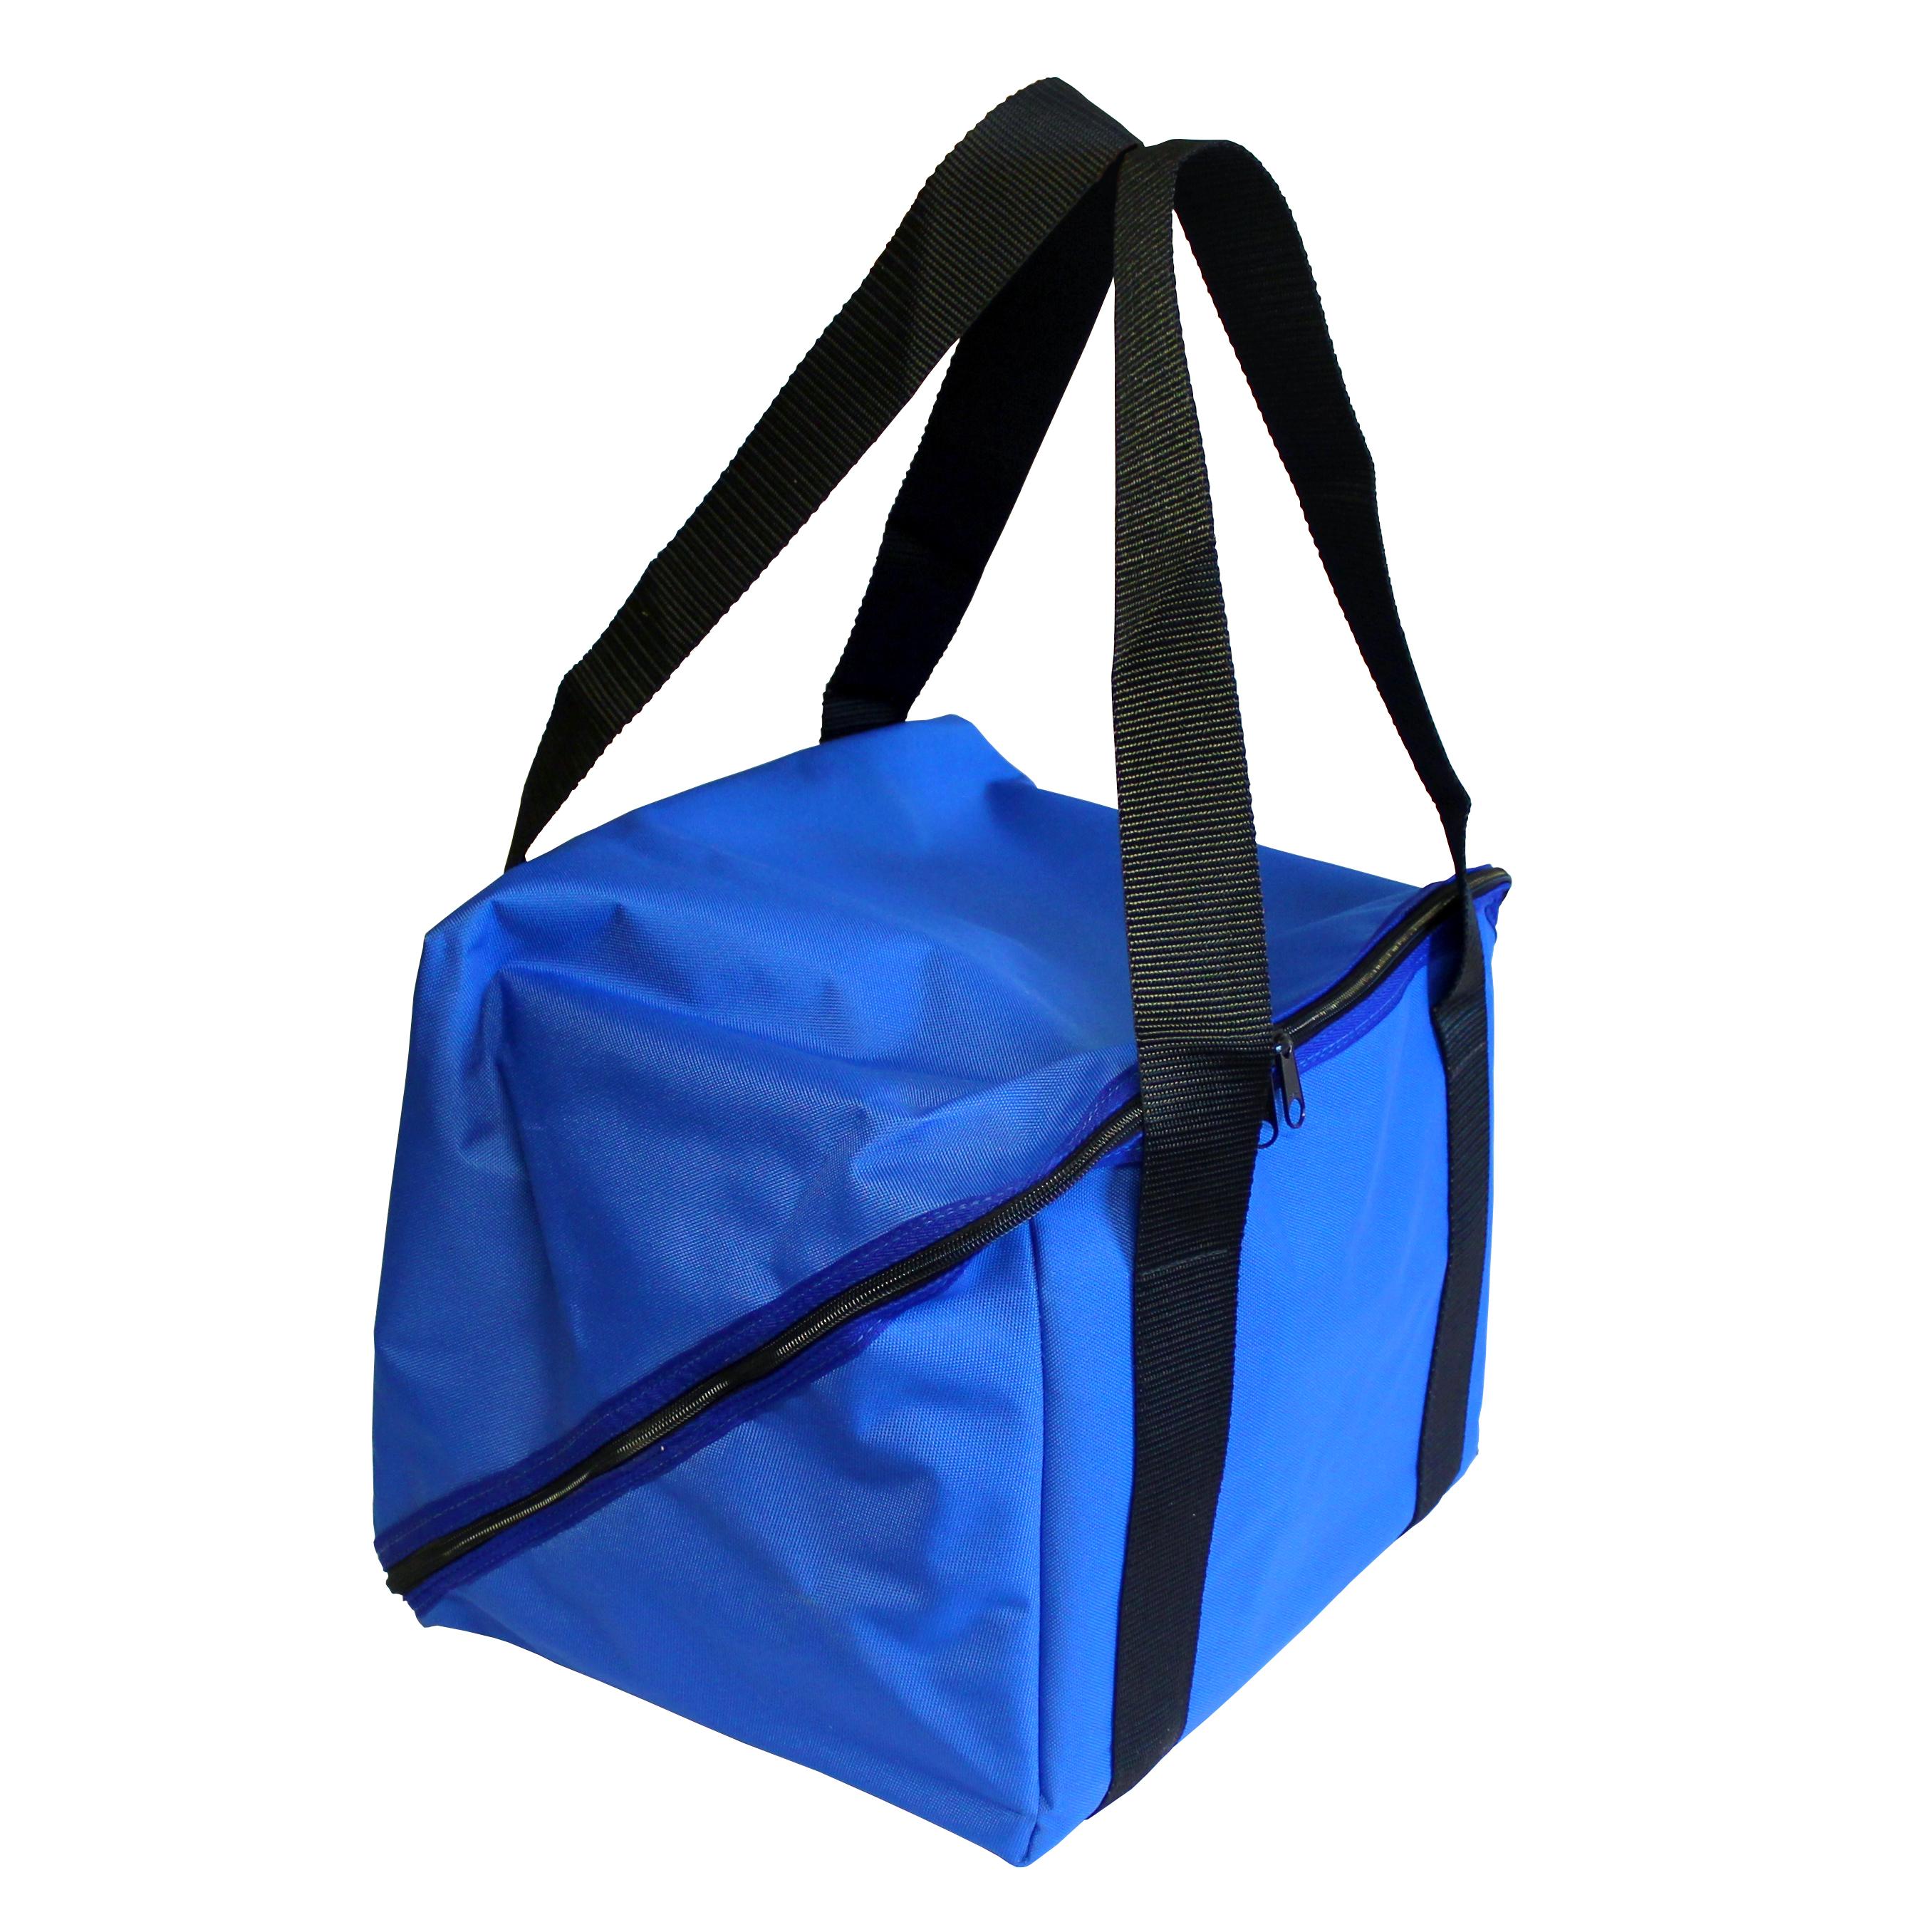 Winch Bag